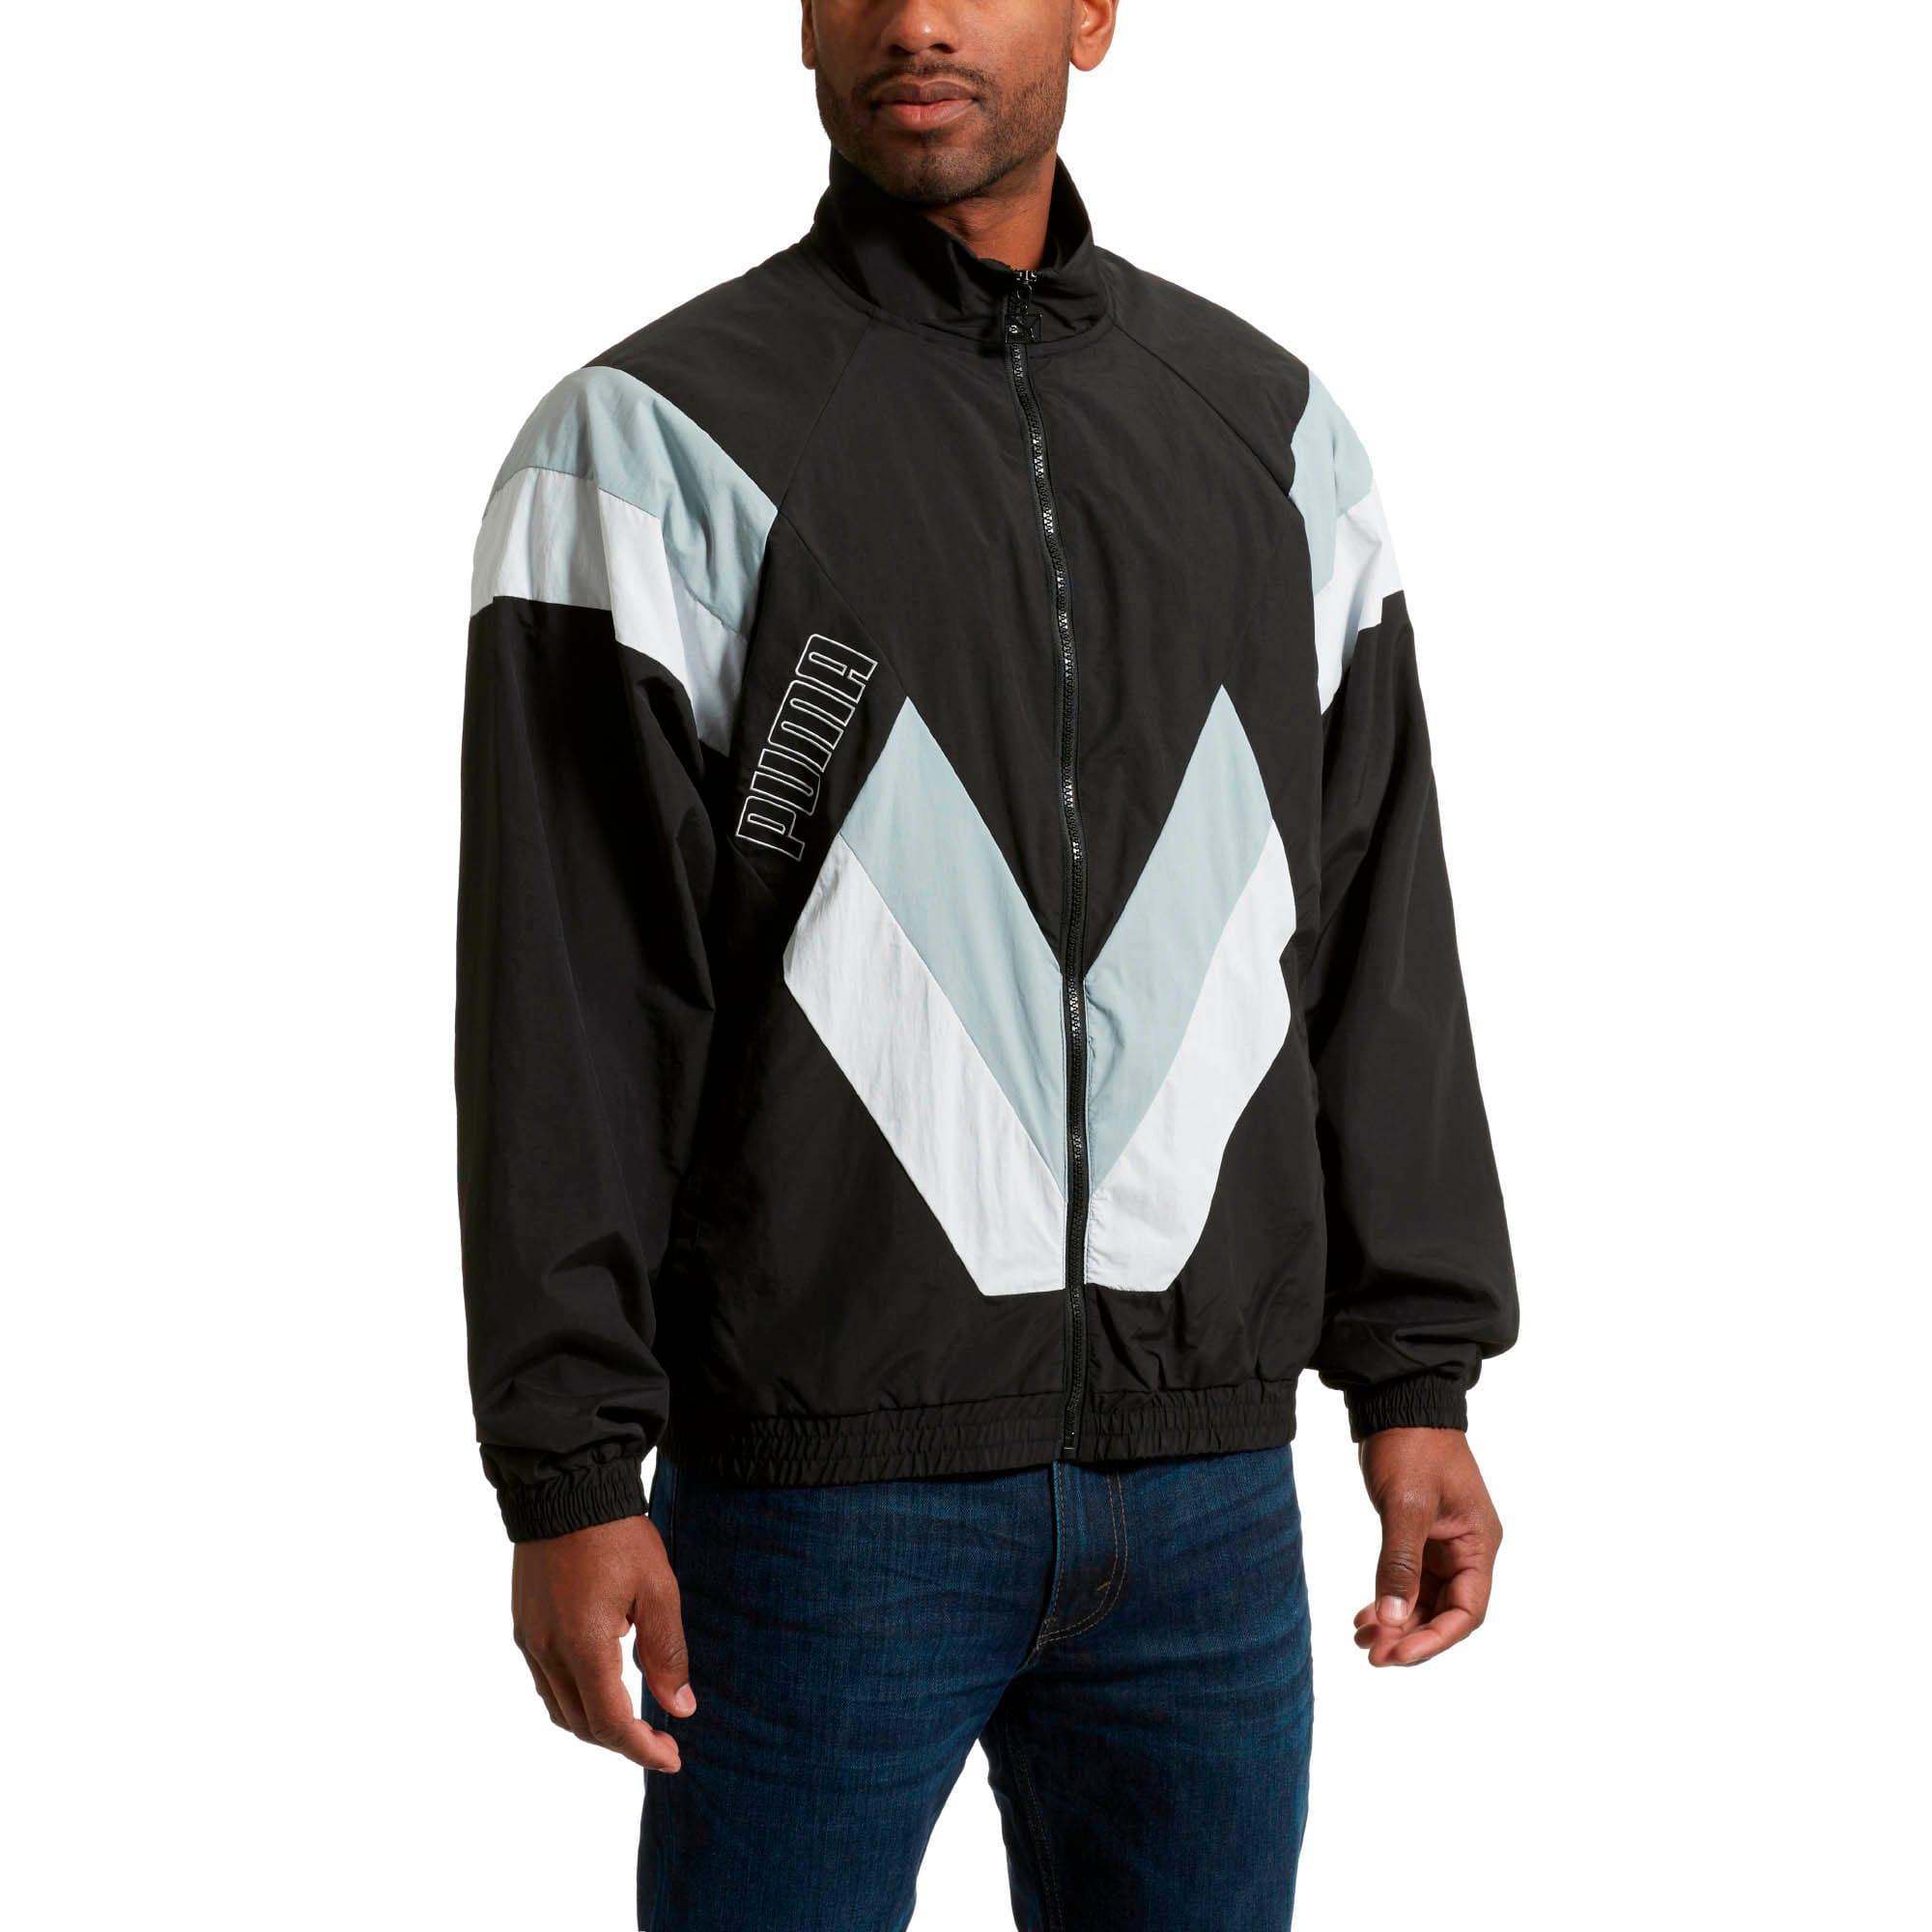 Thumbnail 2 of Heritage Men's Jacket, Puma Black, medium